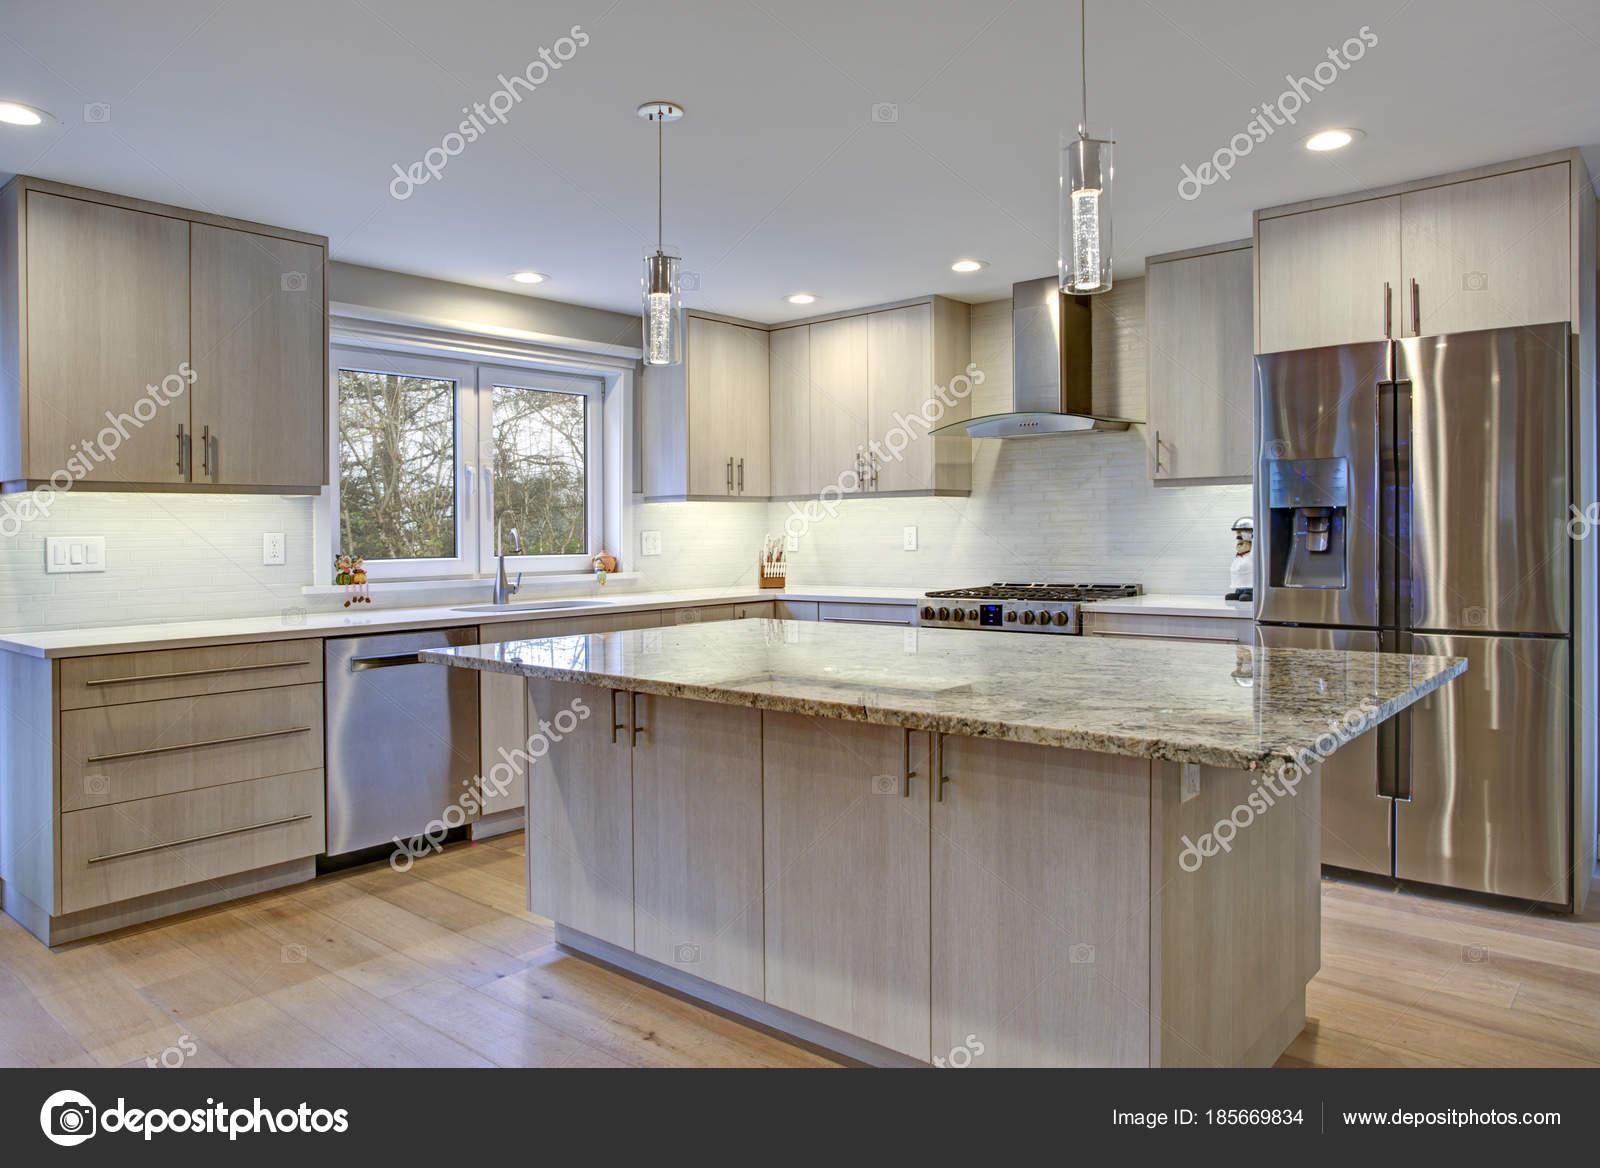 Camera bella cucina con isola di cucina — Foto Stock © alabn #185669834